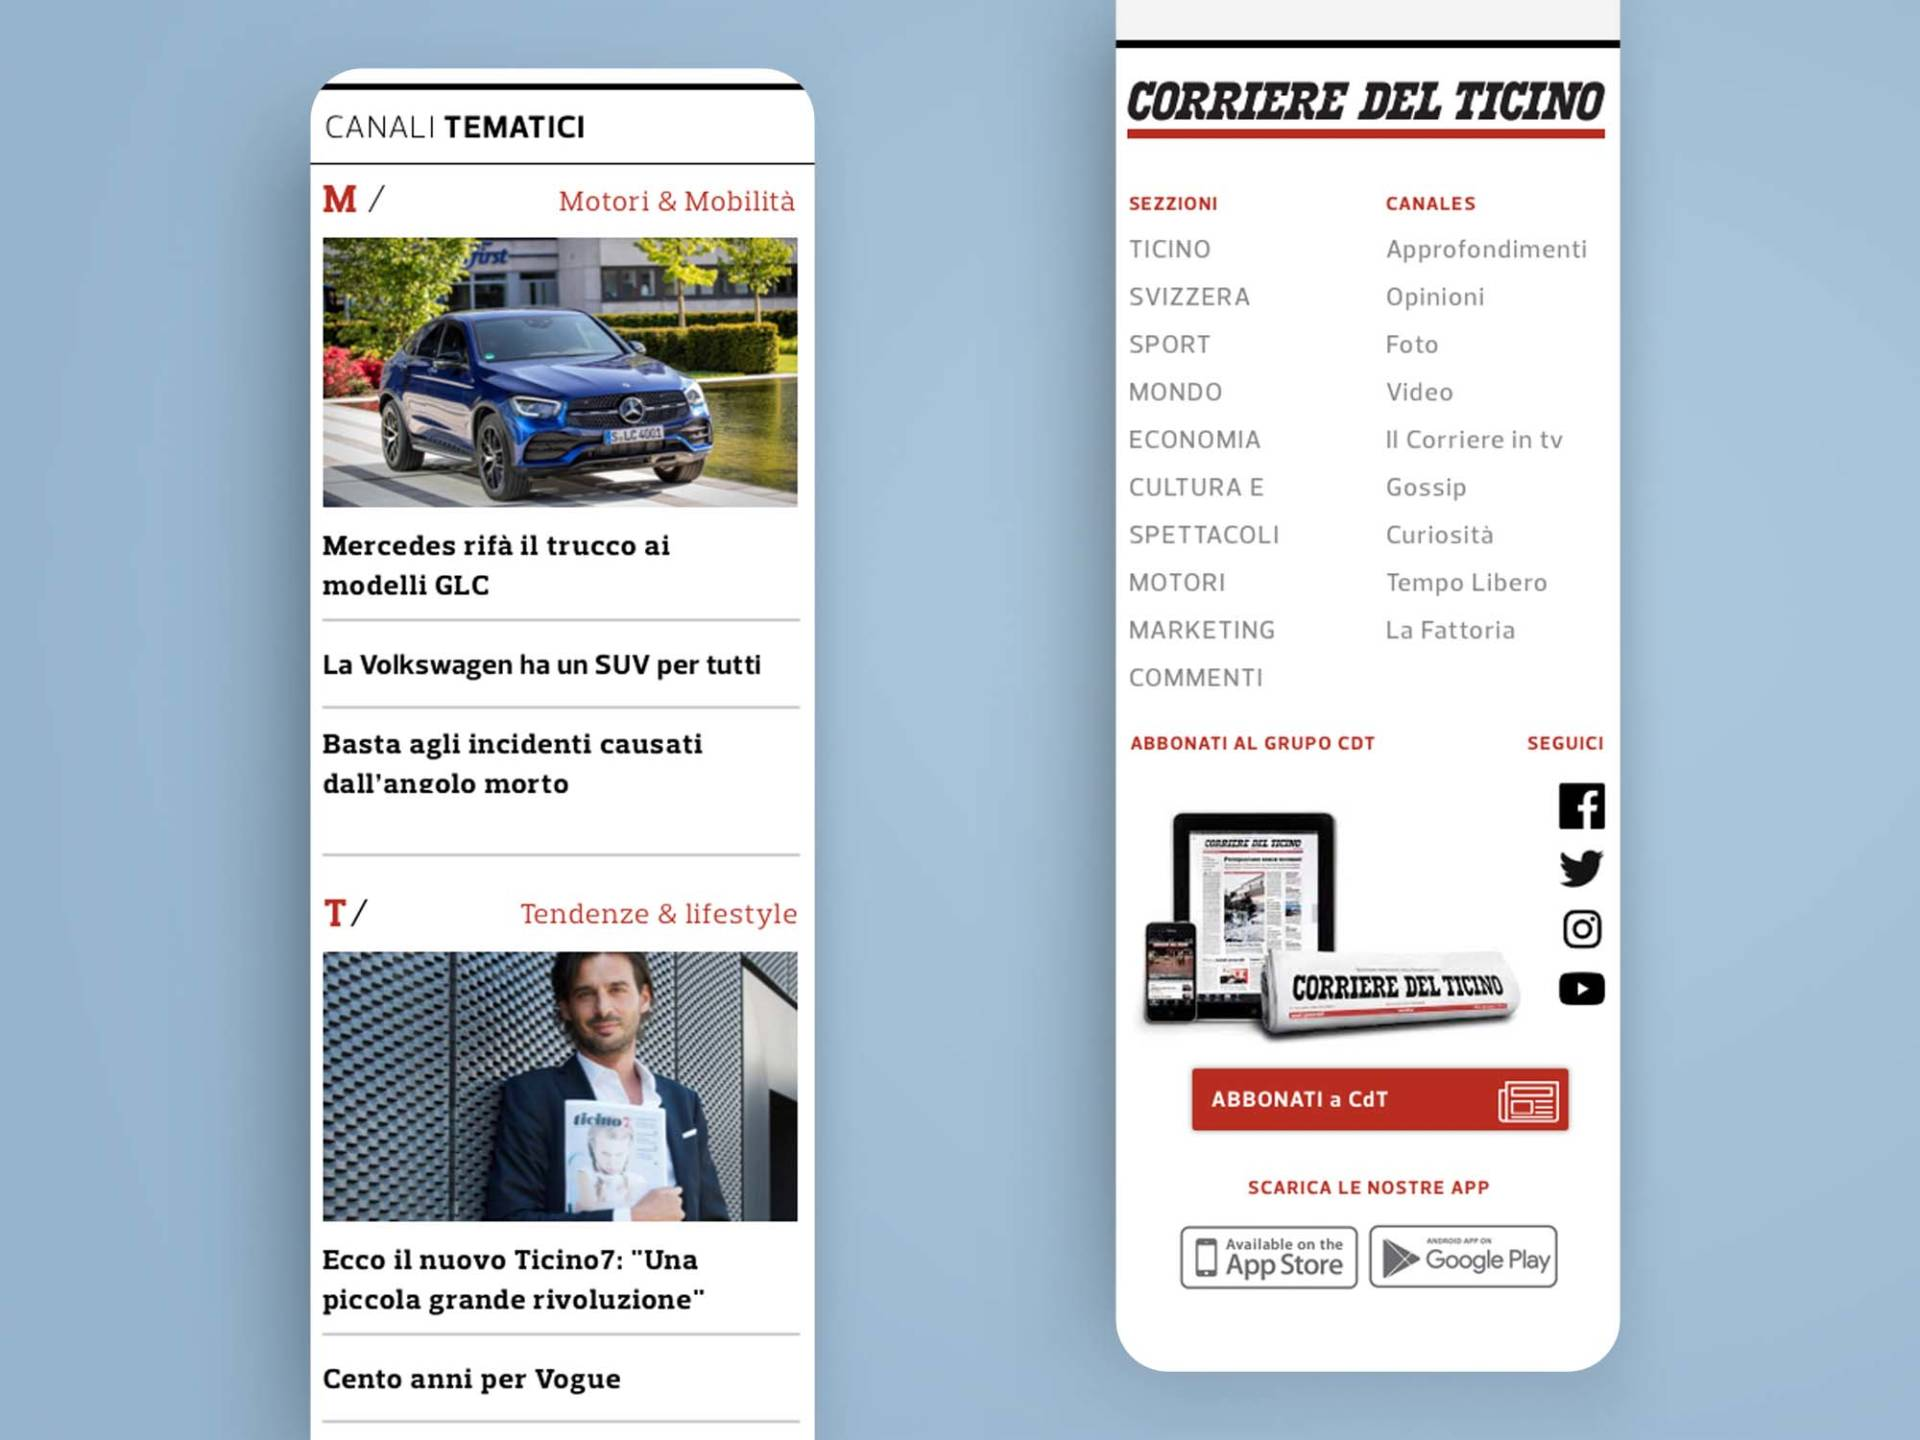 Corriere_del_Ticino web_15_Wenceslau_News_Design